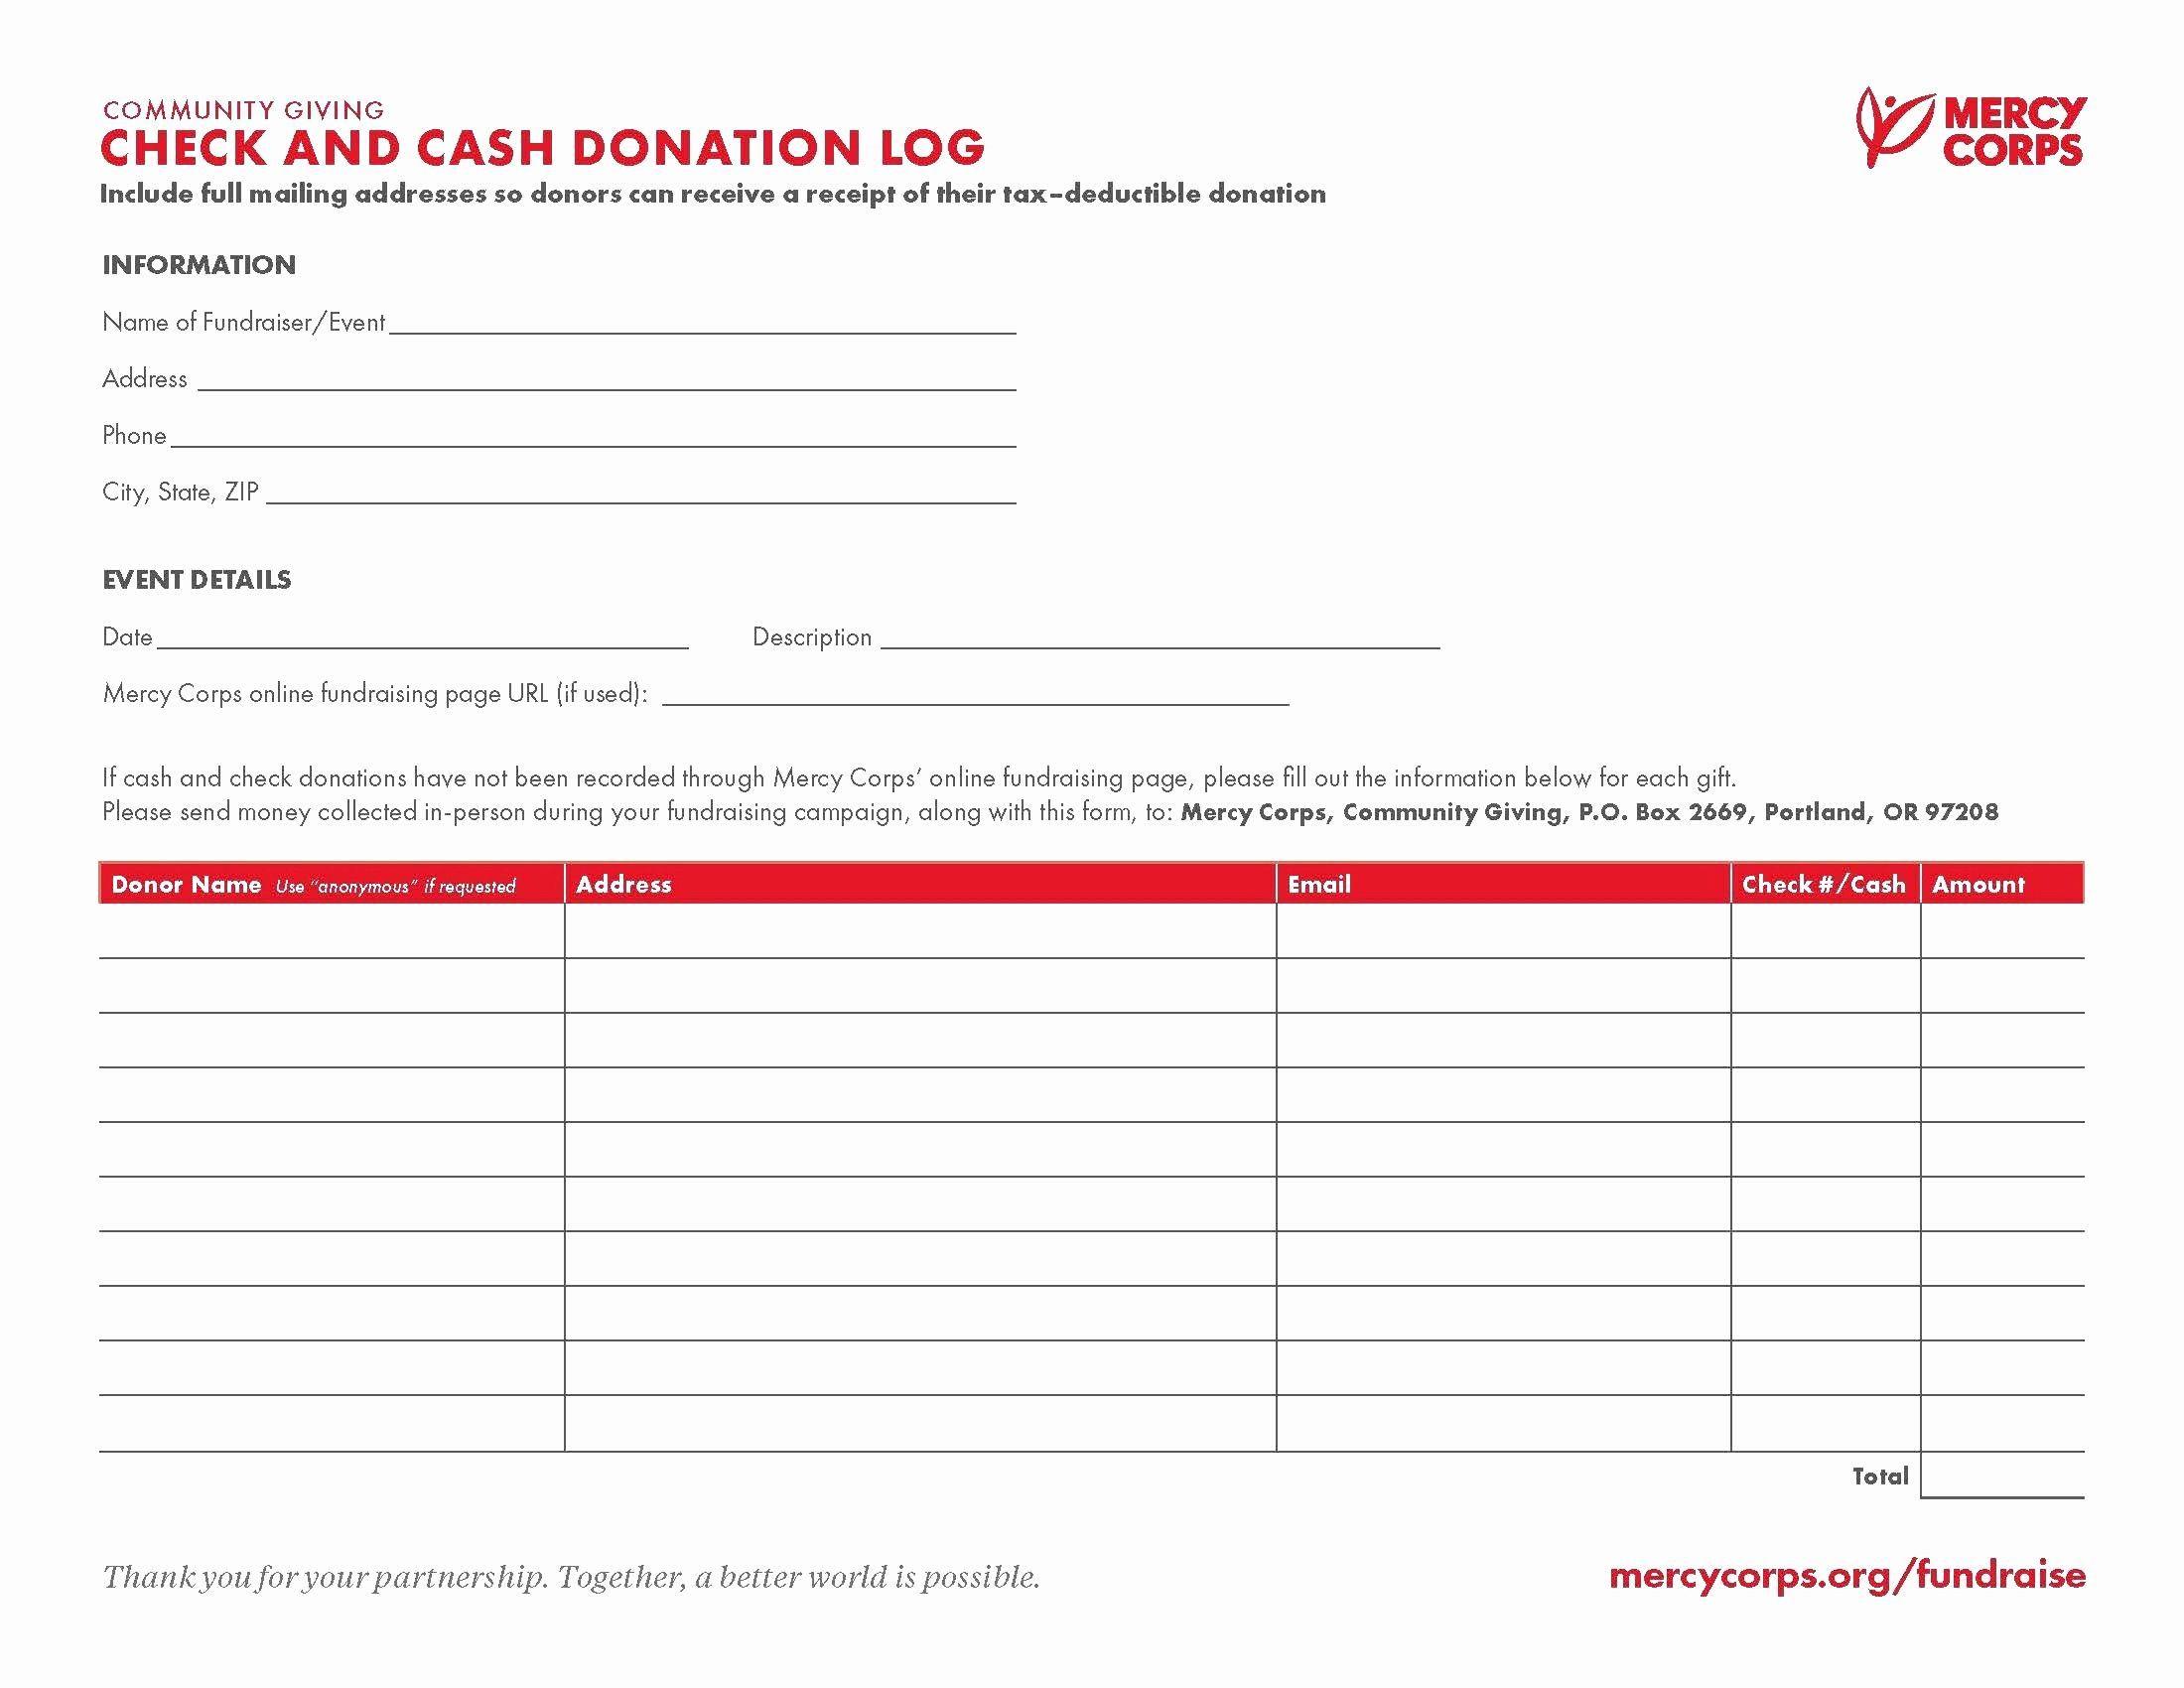 001 Shocking Tax Deductible Donation Receipt Template Australia Design Full